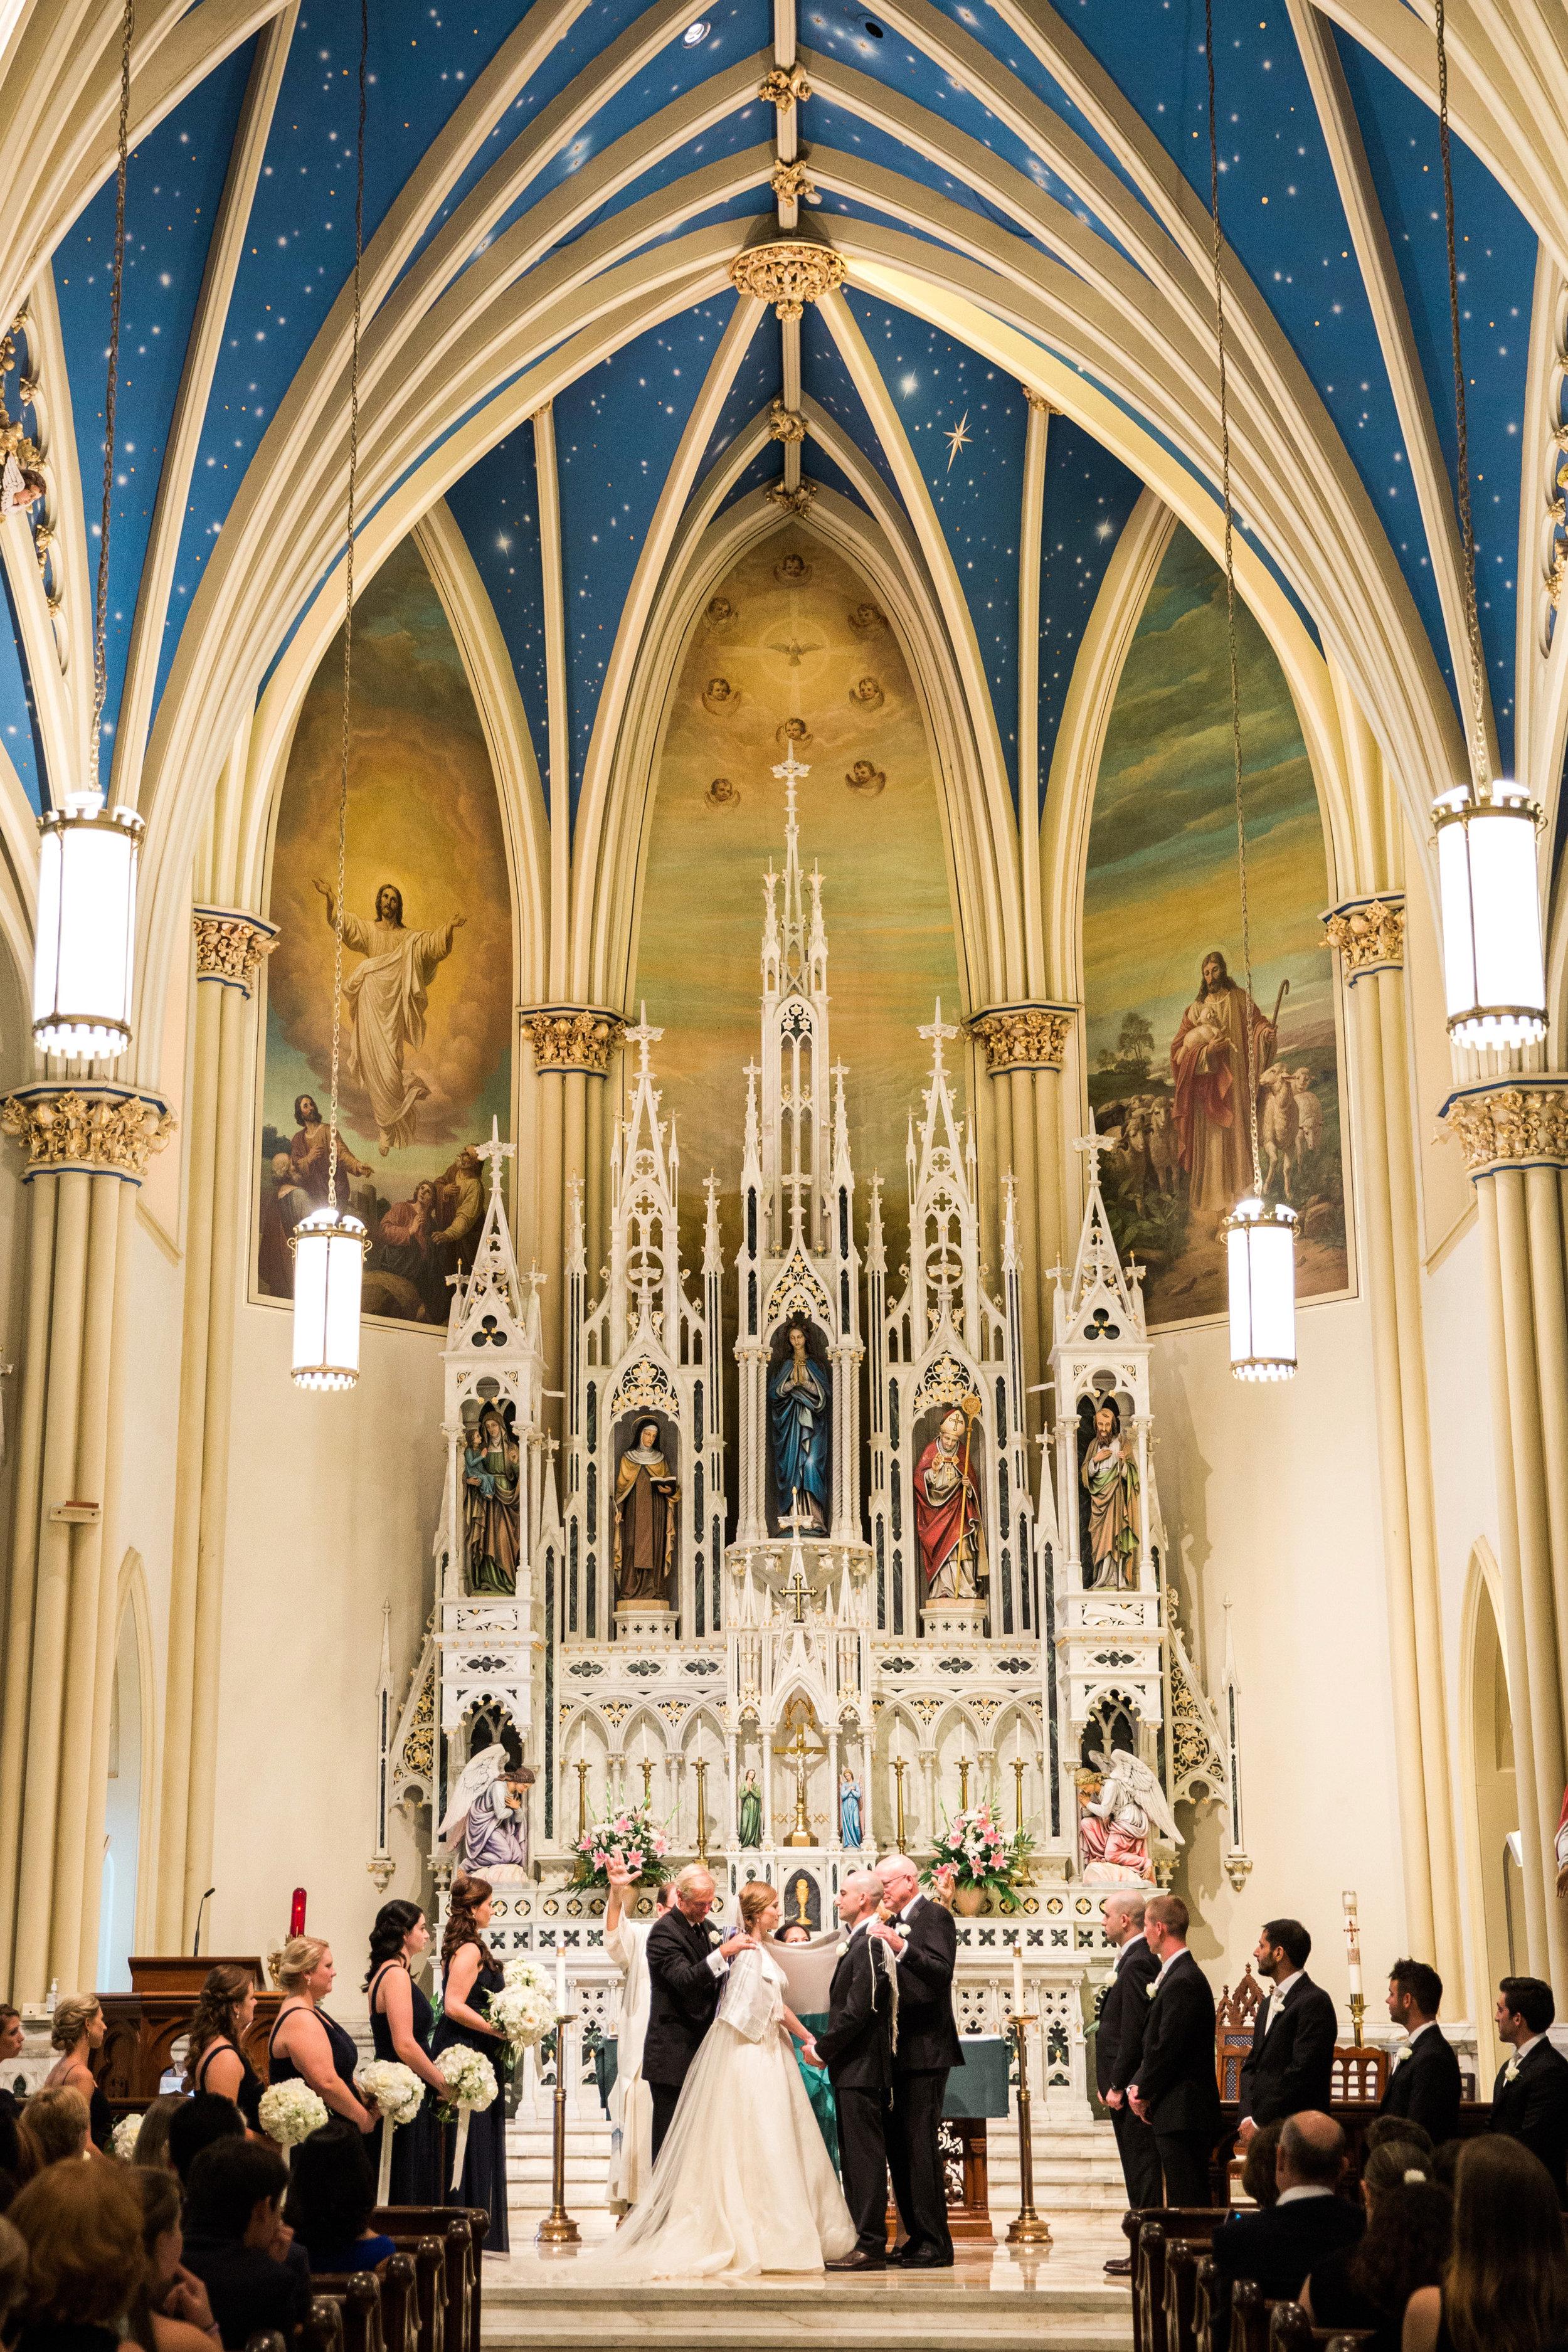 032-MA17_St-Marys-Catholic-Church-Annapolis-Wedding.jpg